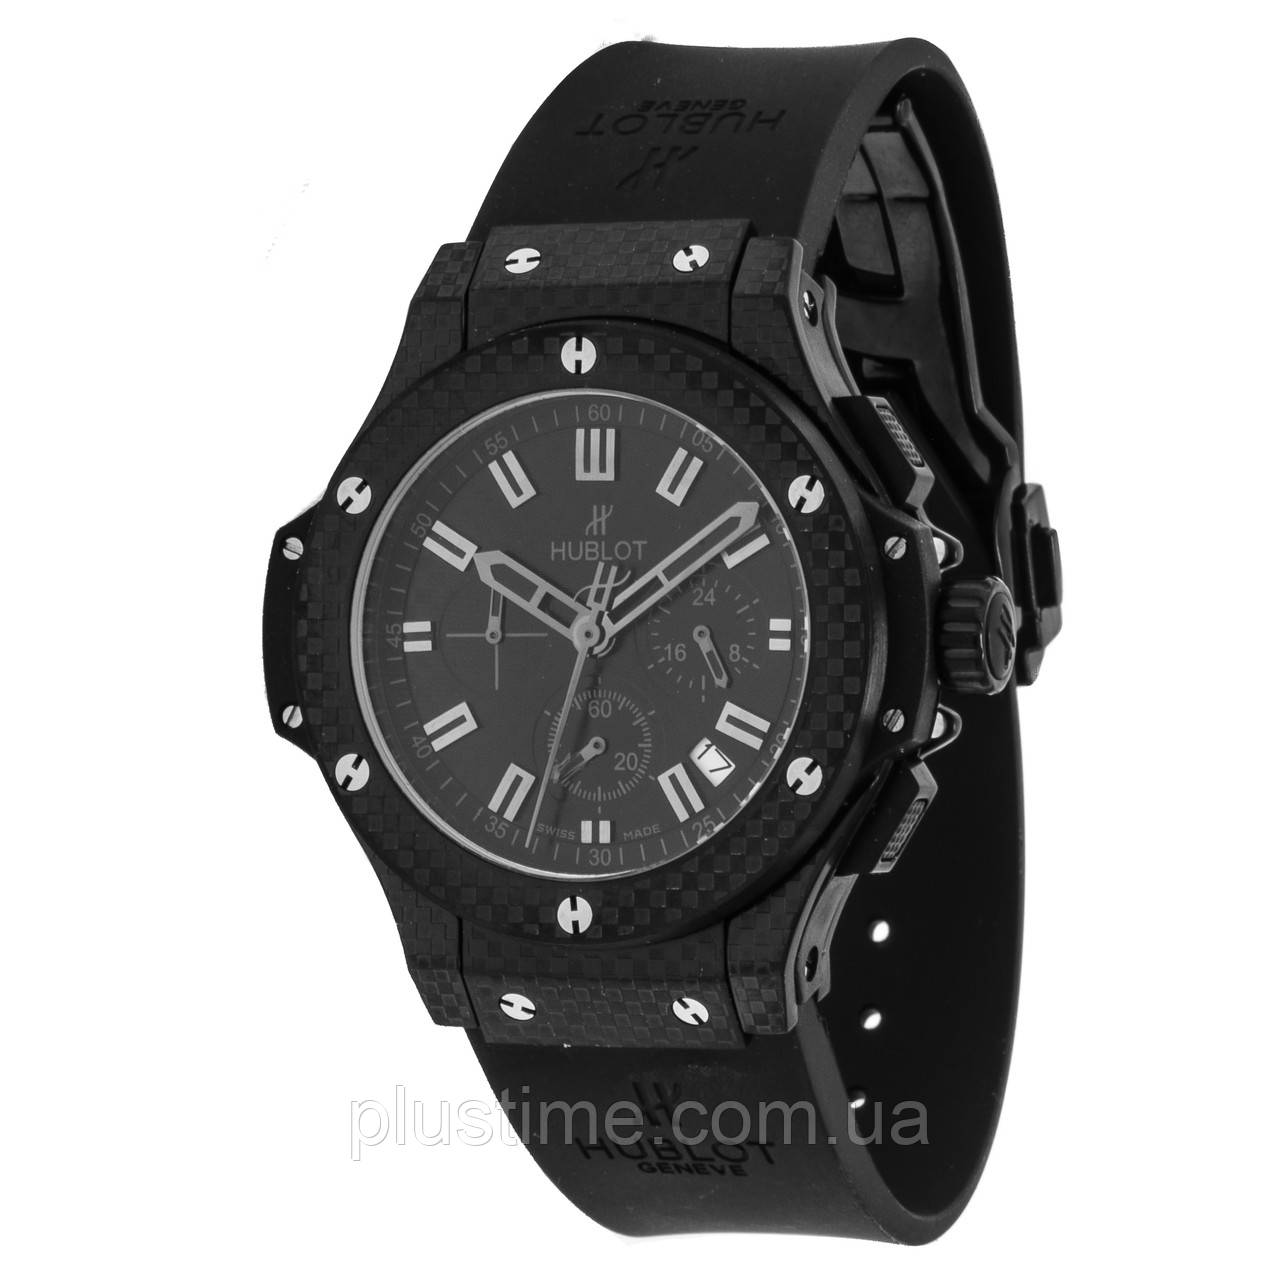 e6e7073e5752 Hublot Big Bang carbon мужские наручные часы хронограф ААА класса - ЧП  Чайка в Полтаве